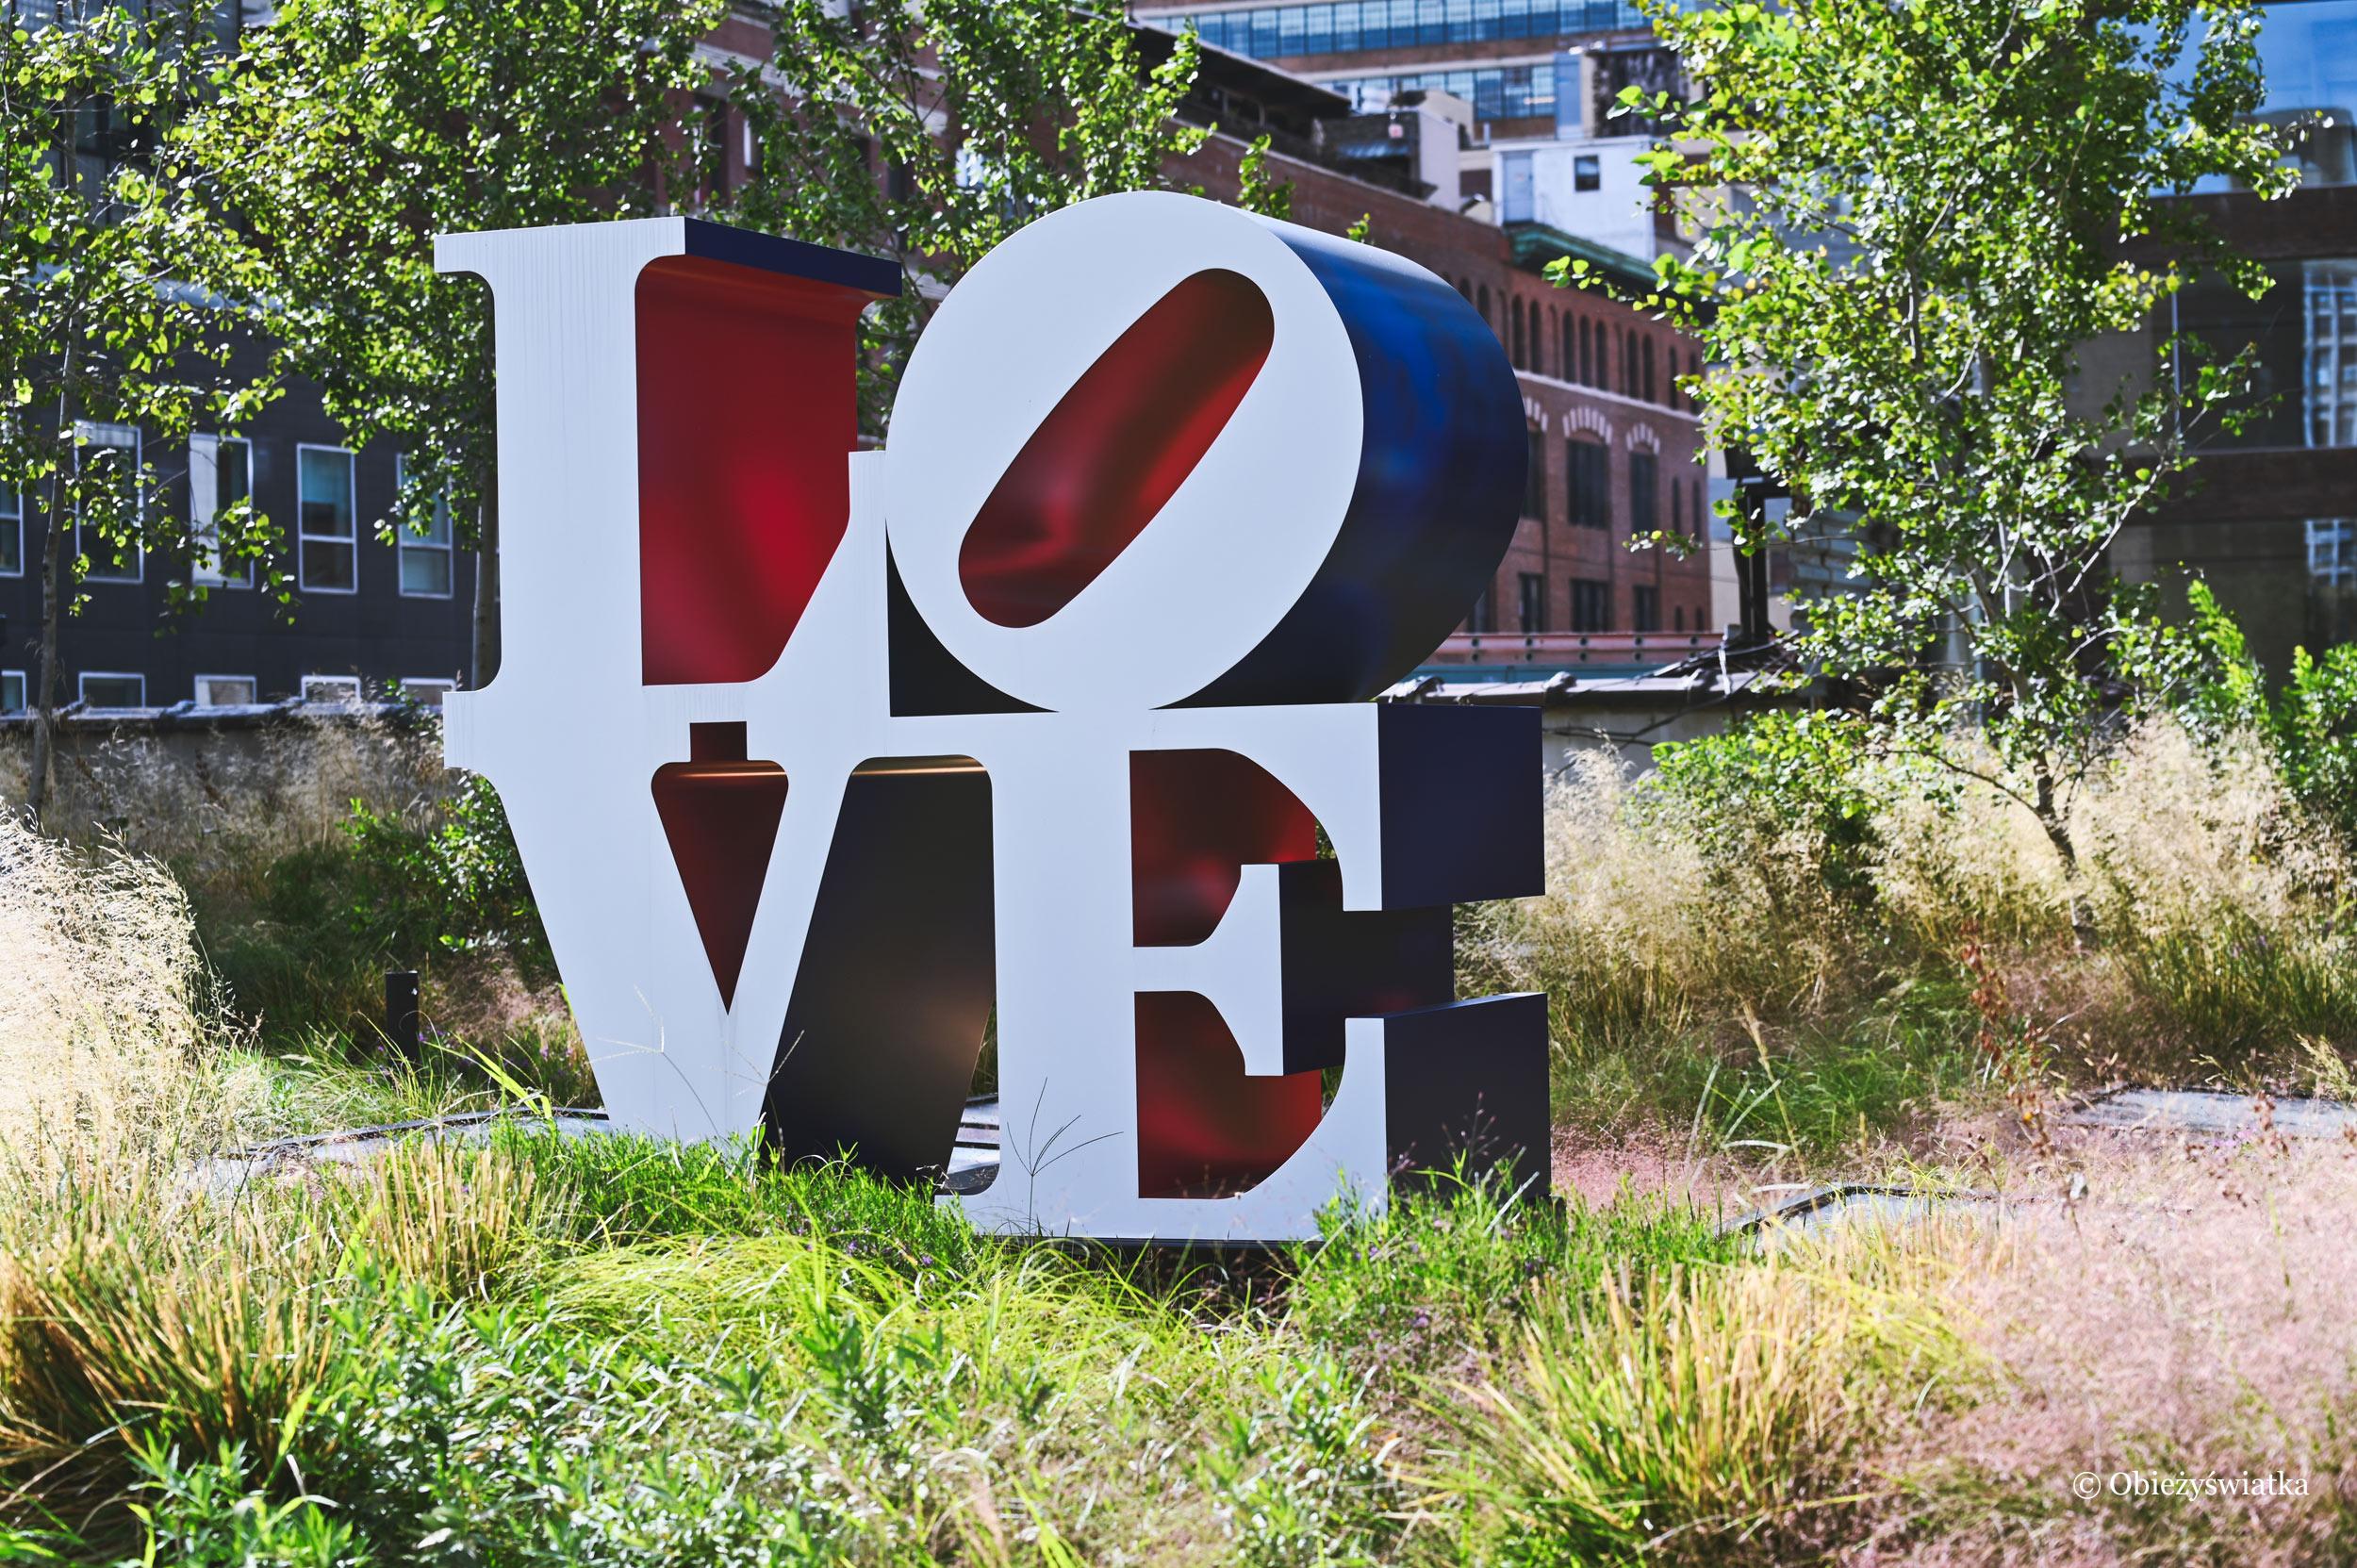 Znana rzeźba LOVE autorstwa Roberta Indiany - park The High Line, Nowy Jork